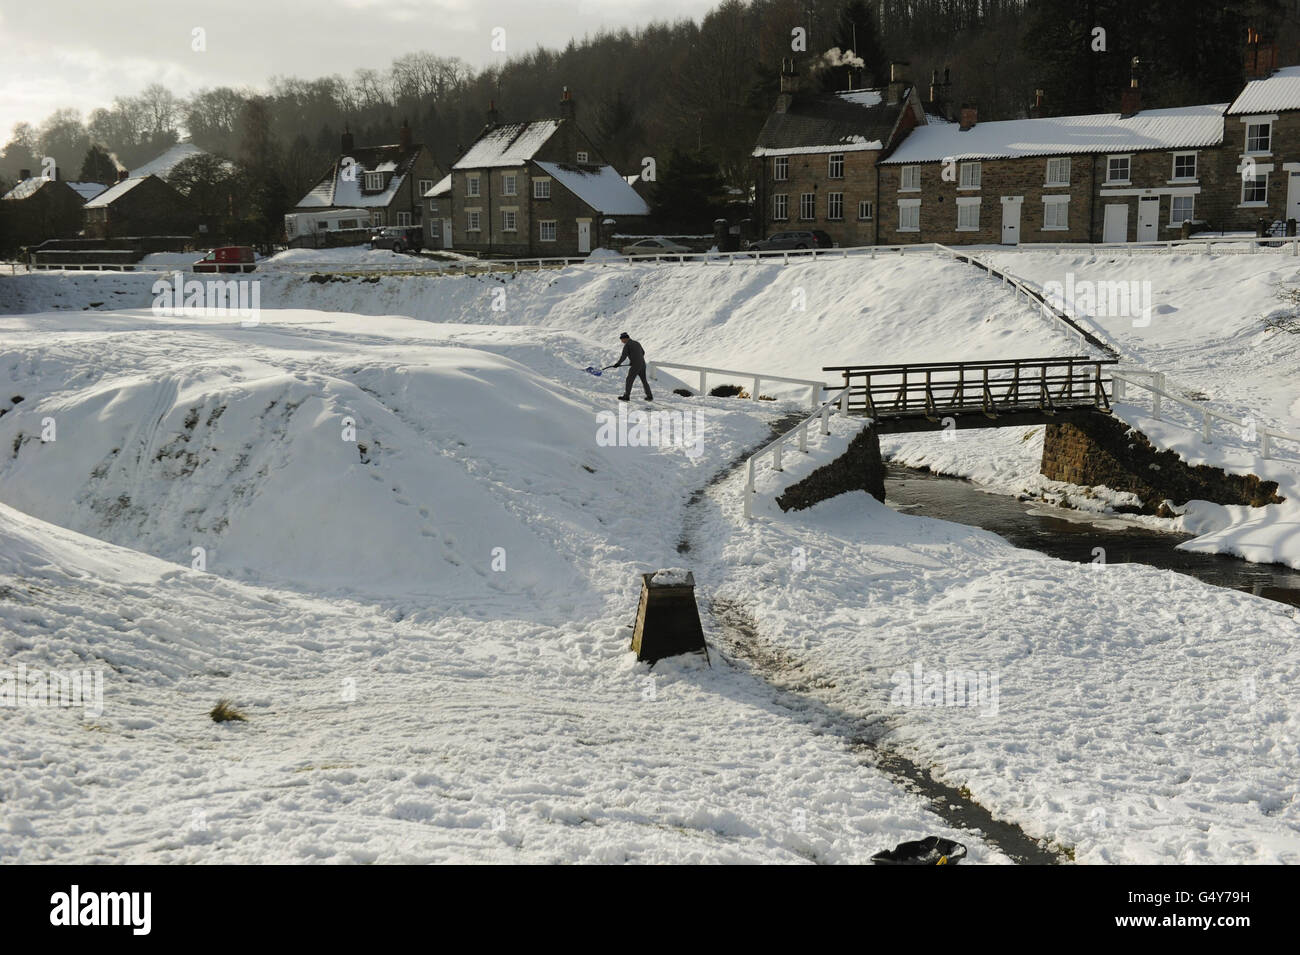 Winter weather Feb 7 - Stock Image